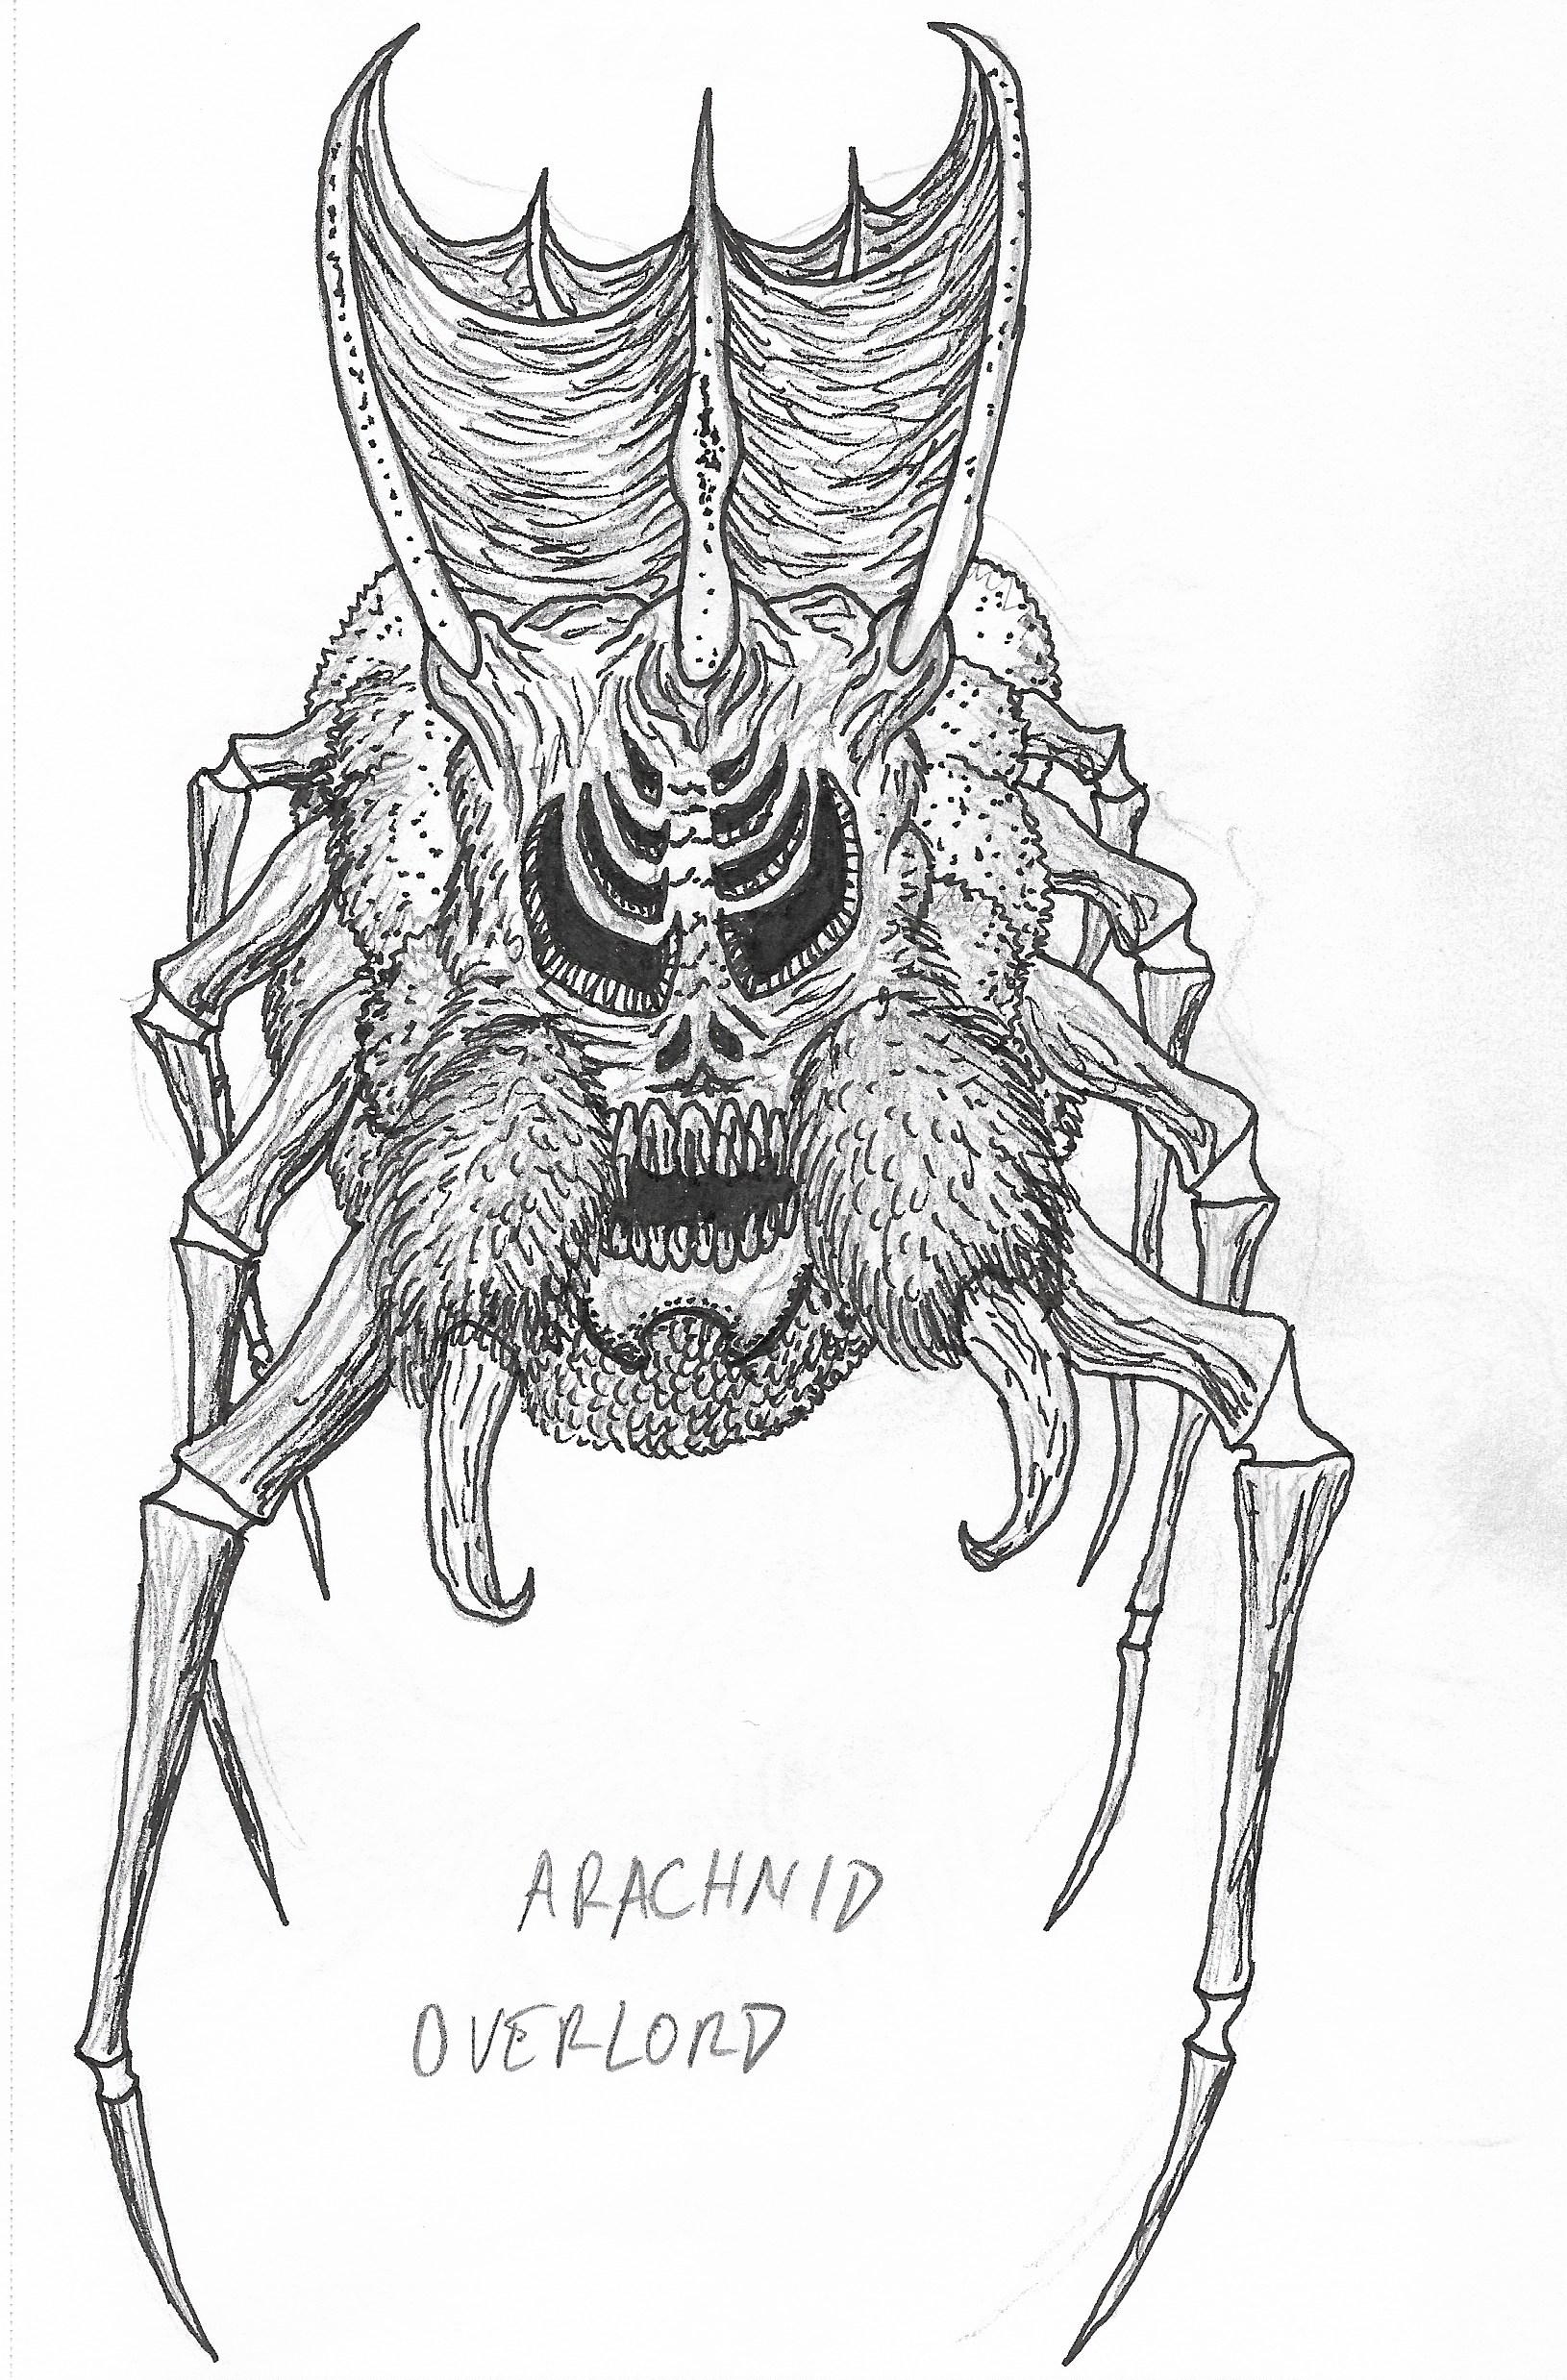 ArachnidoverlordSCAN